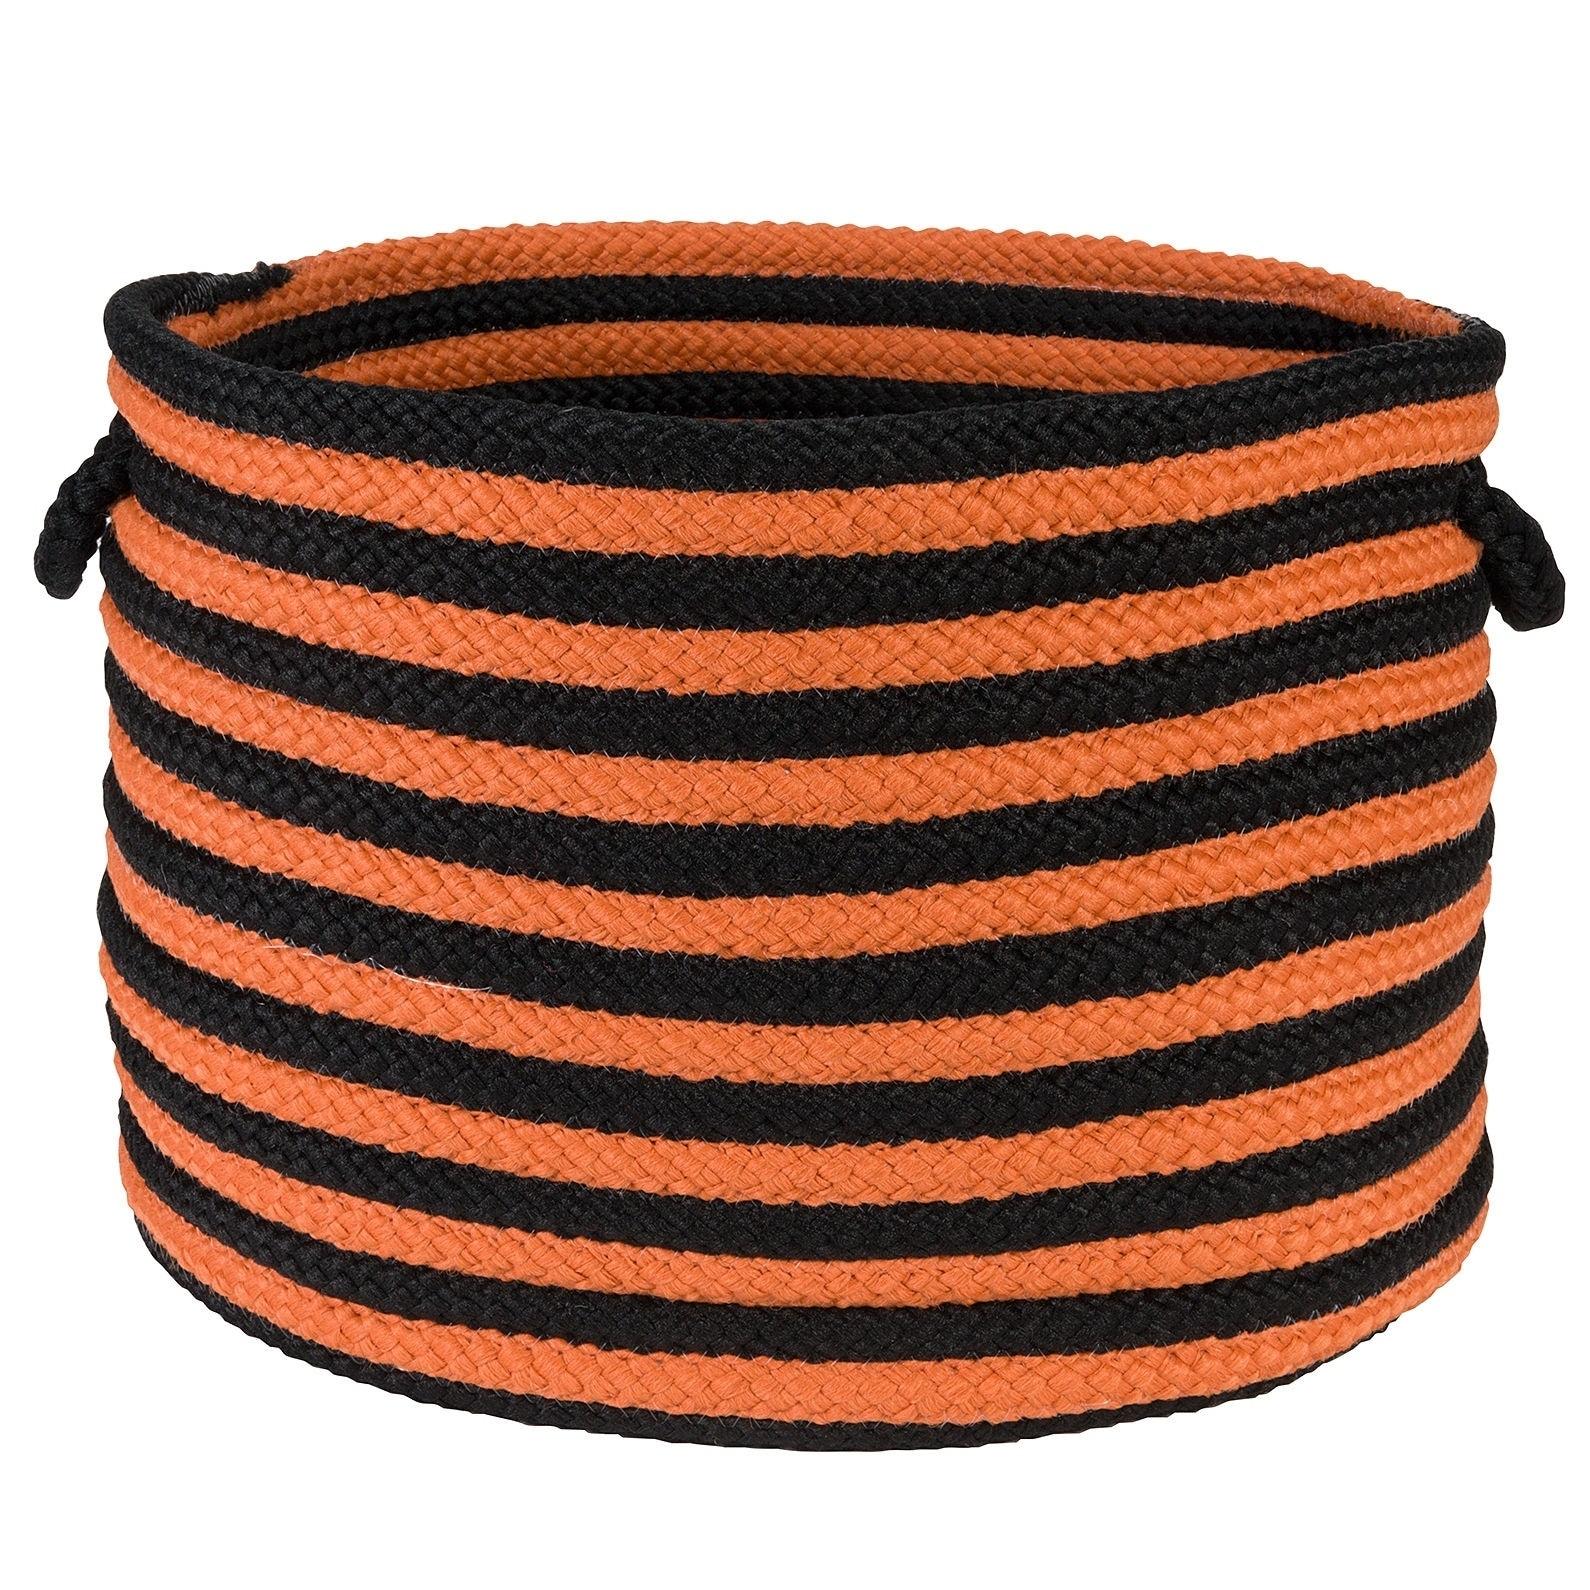 Halloween Baskets (Halloween Basket Black & Orange 14x10)